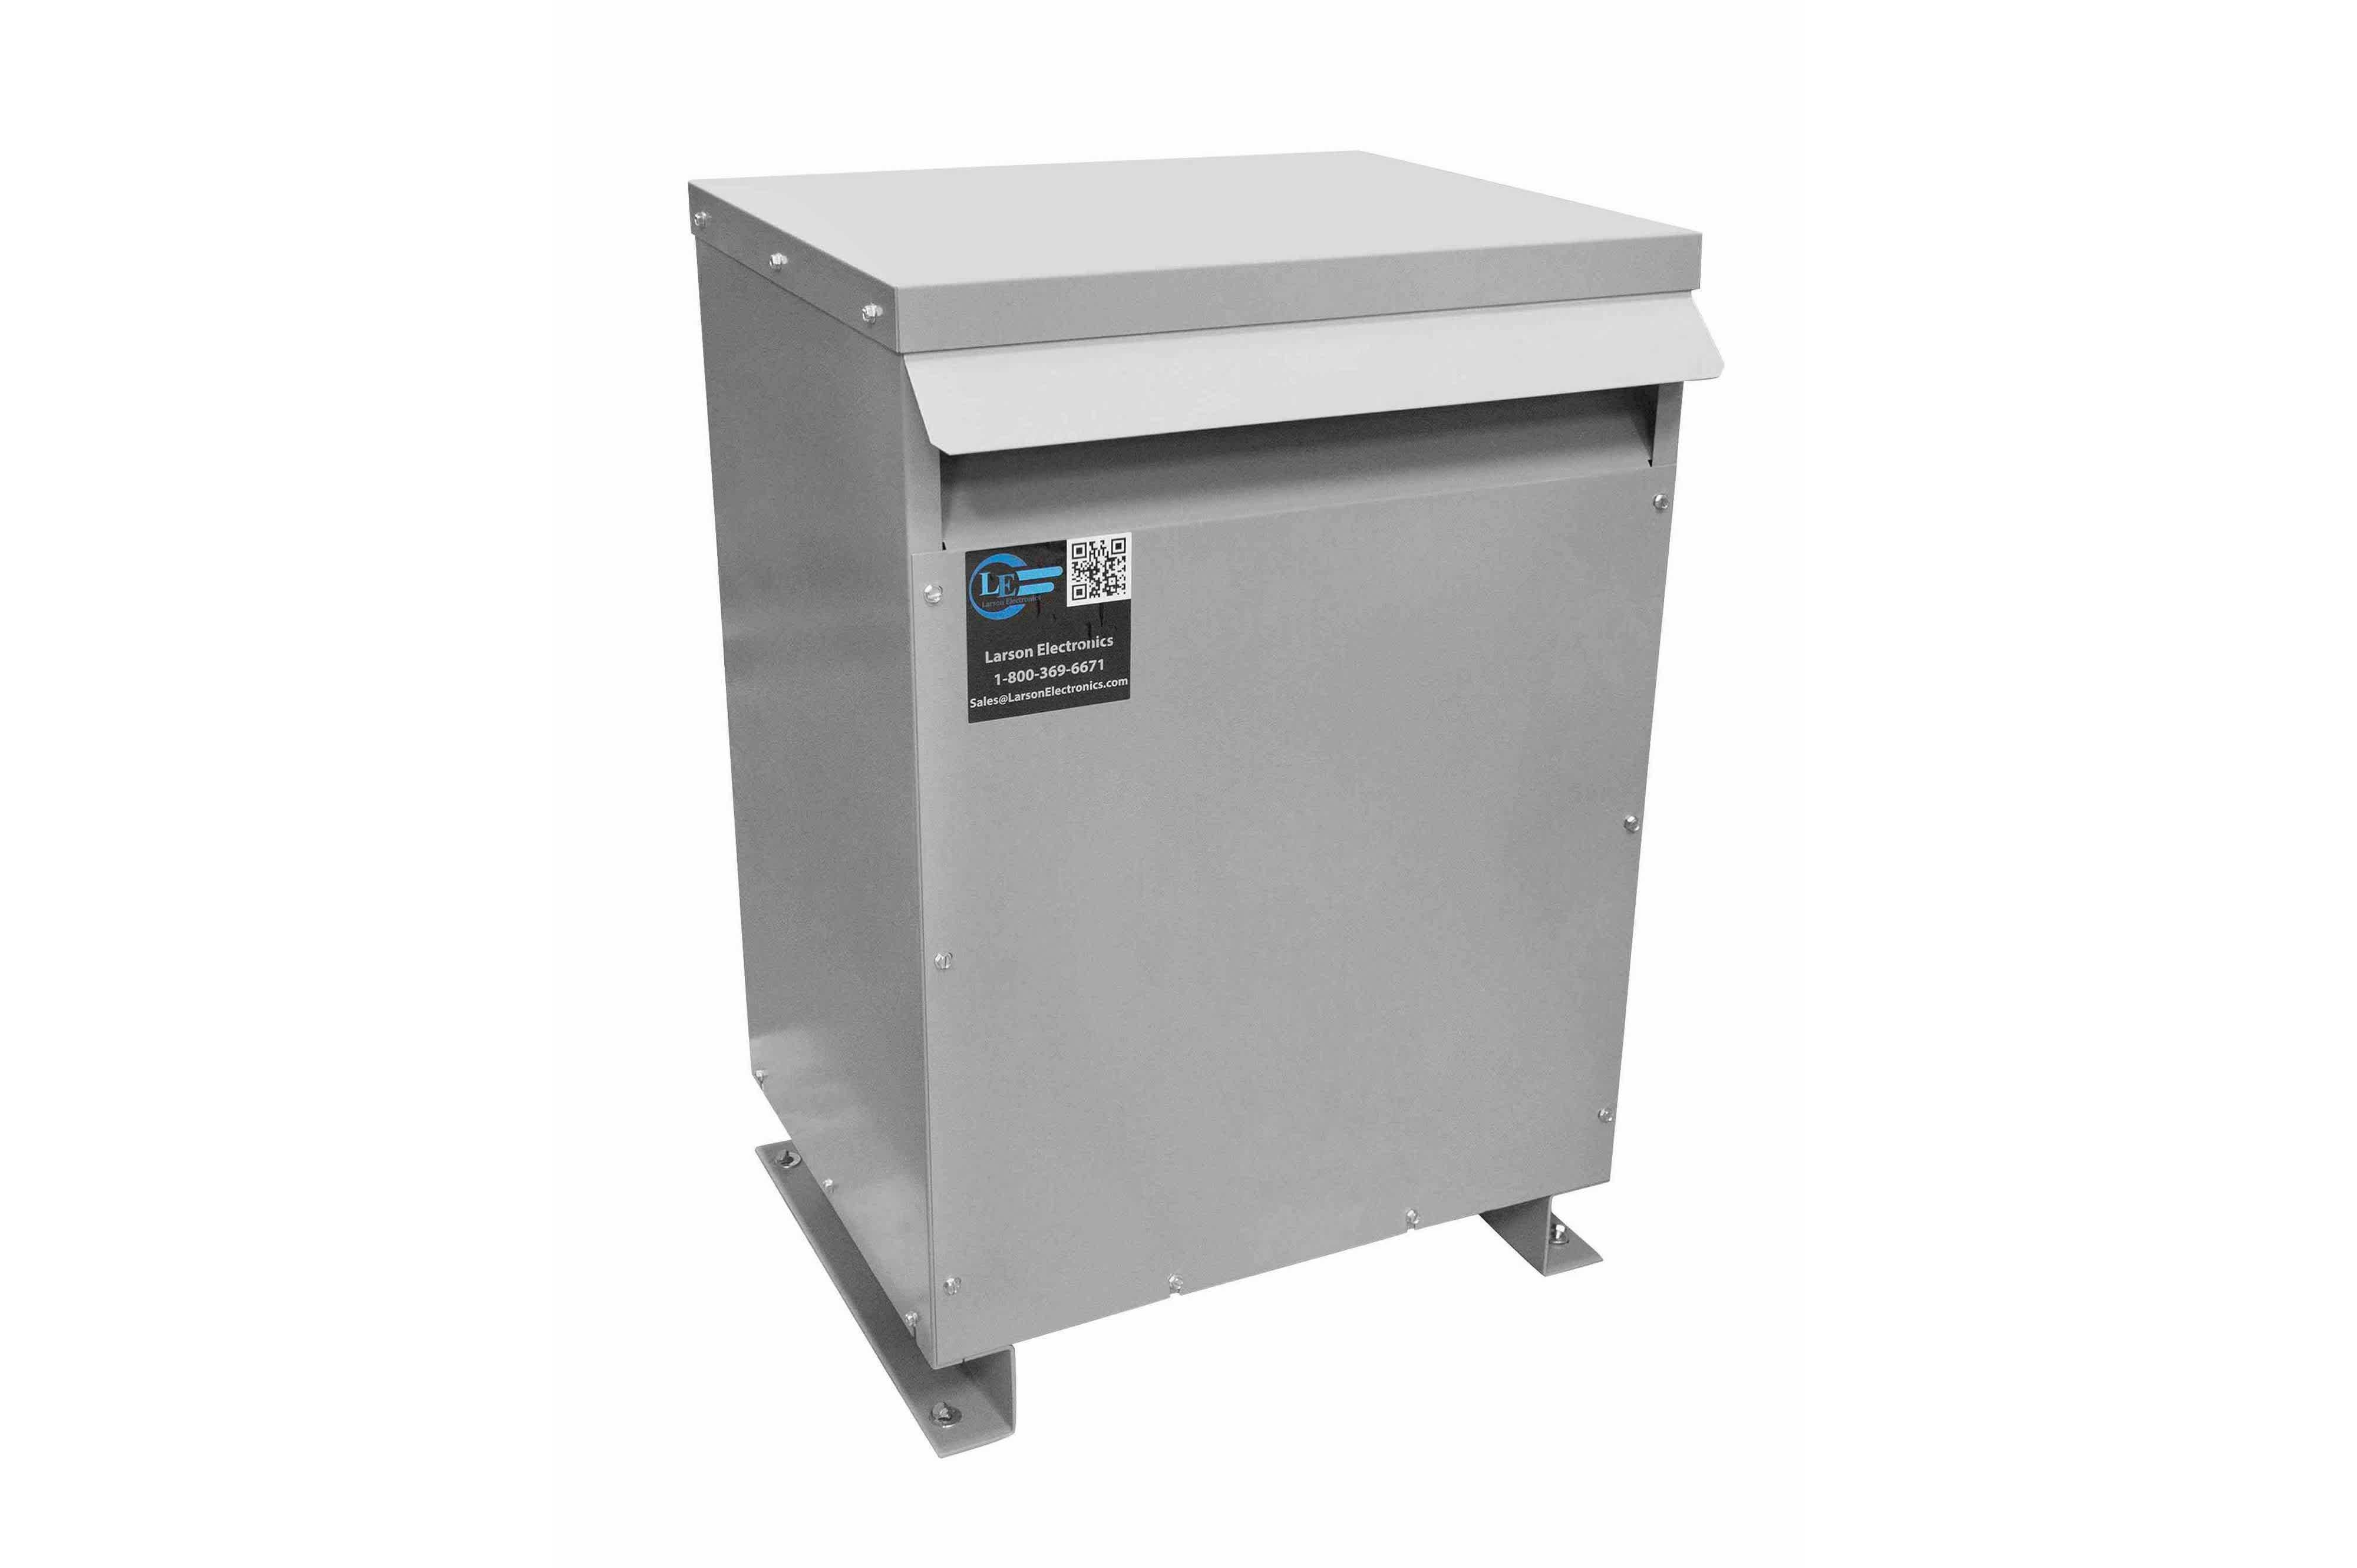 250 kVA 3PH DOE Transformer, 400V Delta Primary, 480Y/277 Wye-N Secondary, N3R, Ventilated, 60 Hz